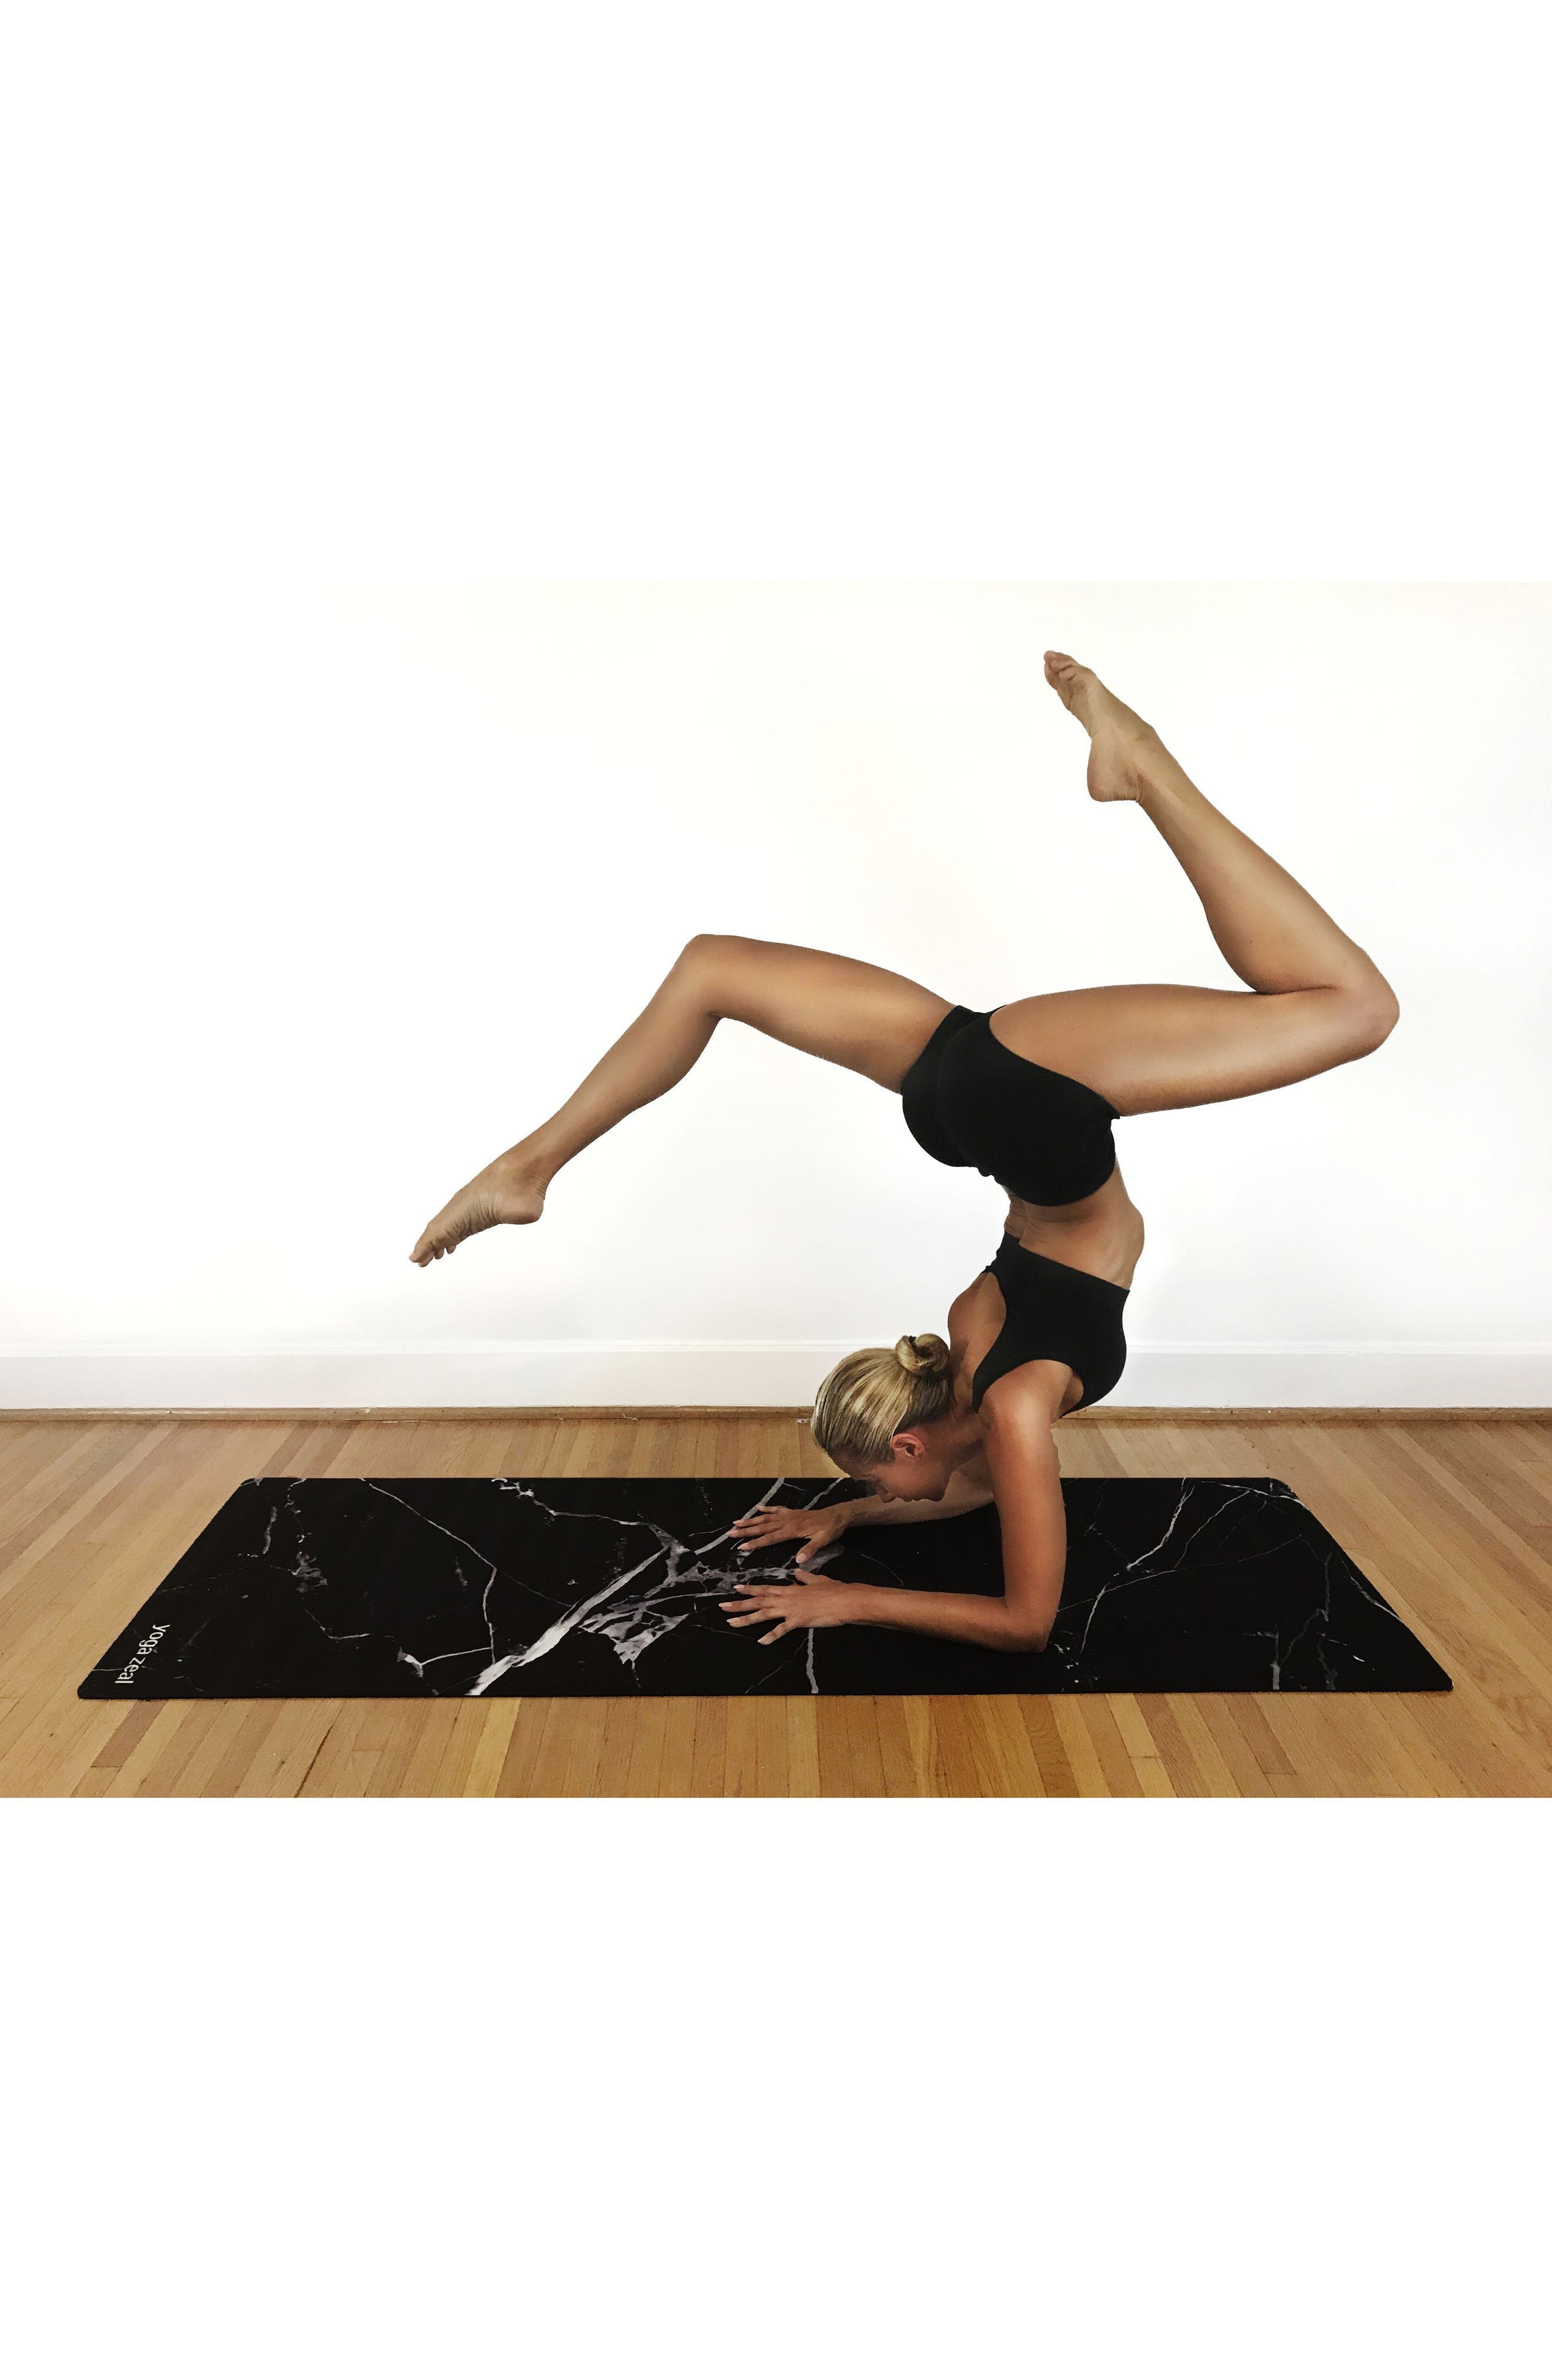 Marble Print Yoga Mat,                             Alternate thumbnail 2, color,                             BLACK MARBLE